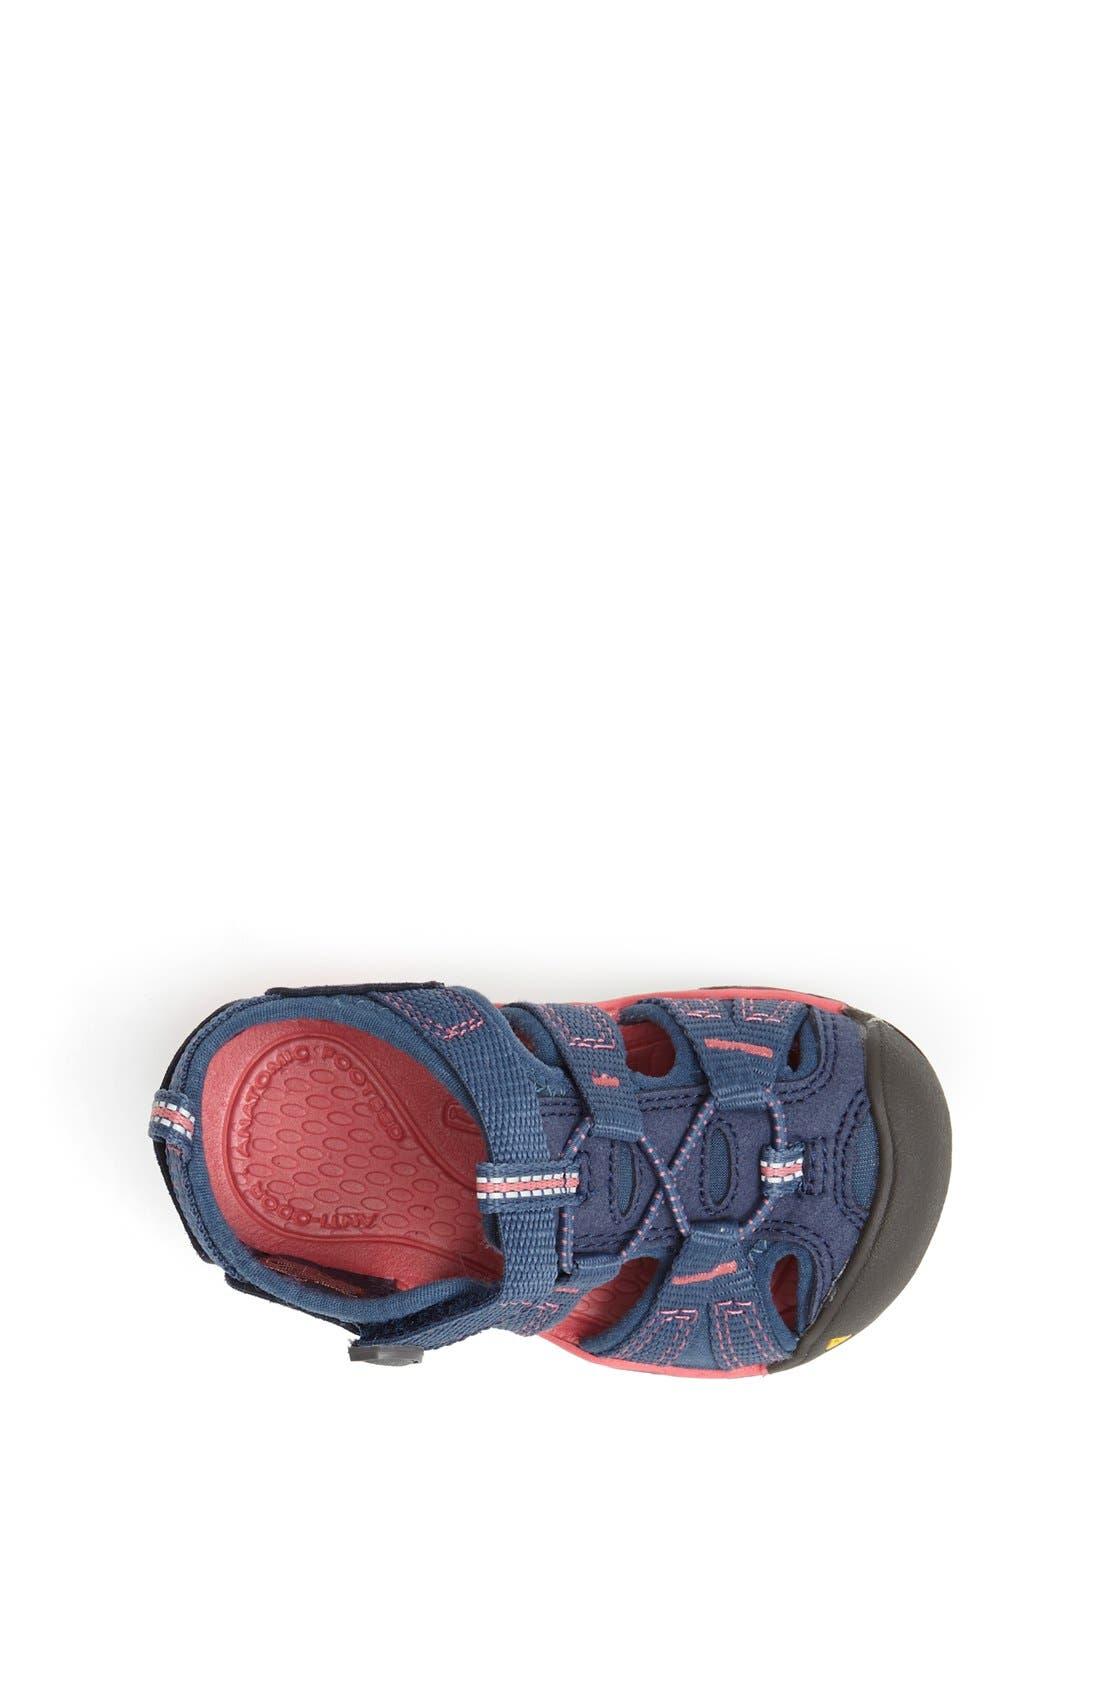 'Seacamp II' Waterproof Sandal,                             Alternate thumbnail 3, color,                             Blue Rose